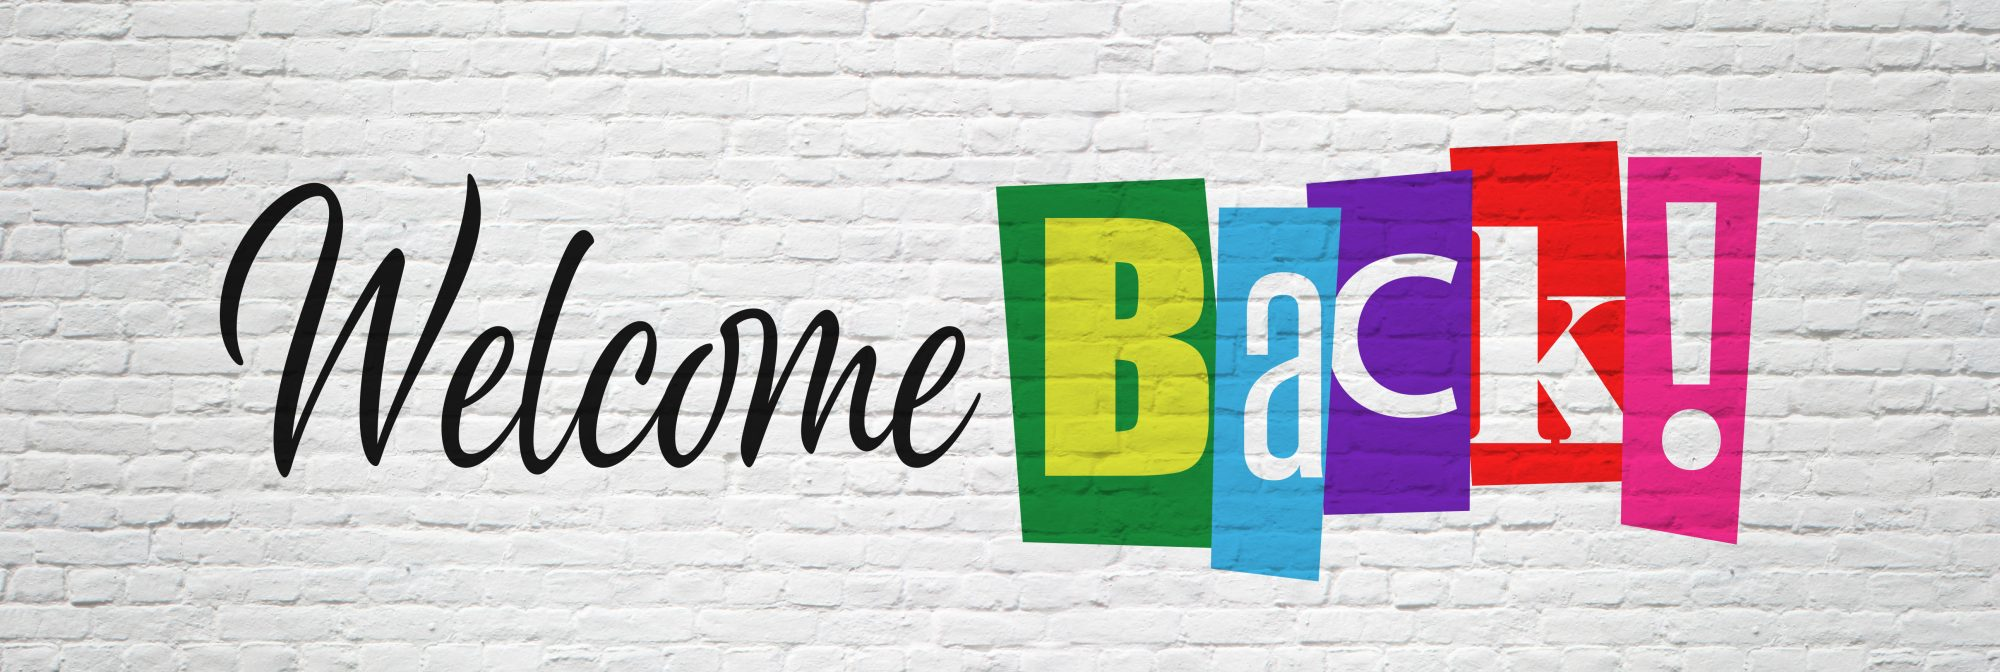 Bunter Welcome Back Schriftzug auf Backsteinmauer